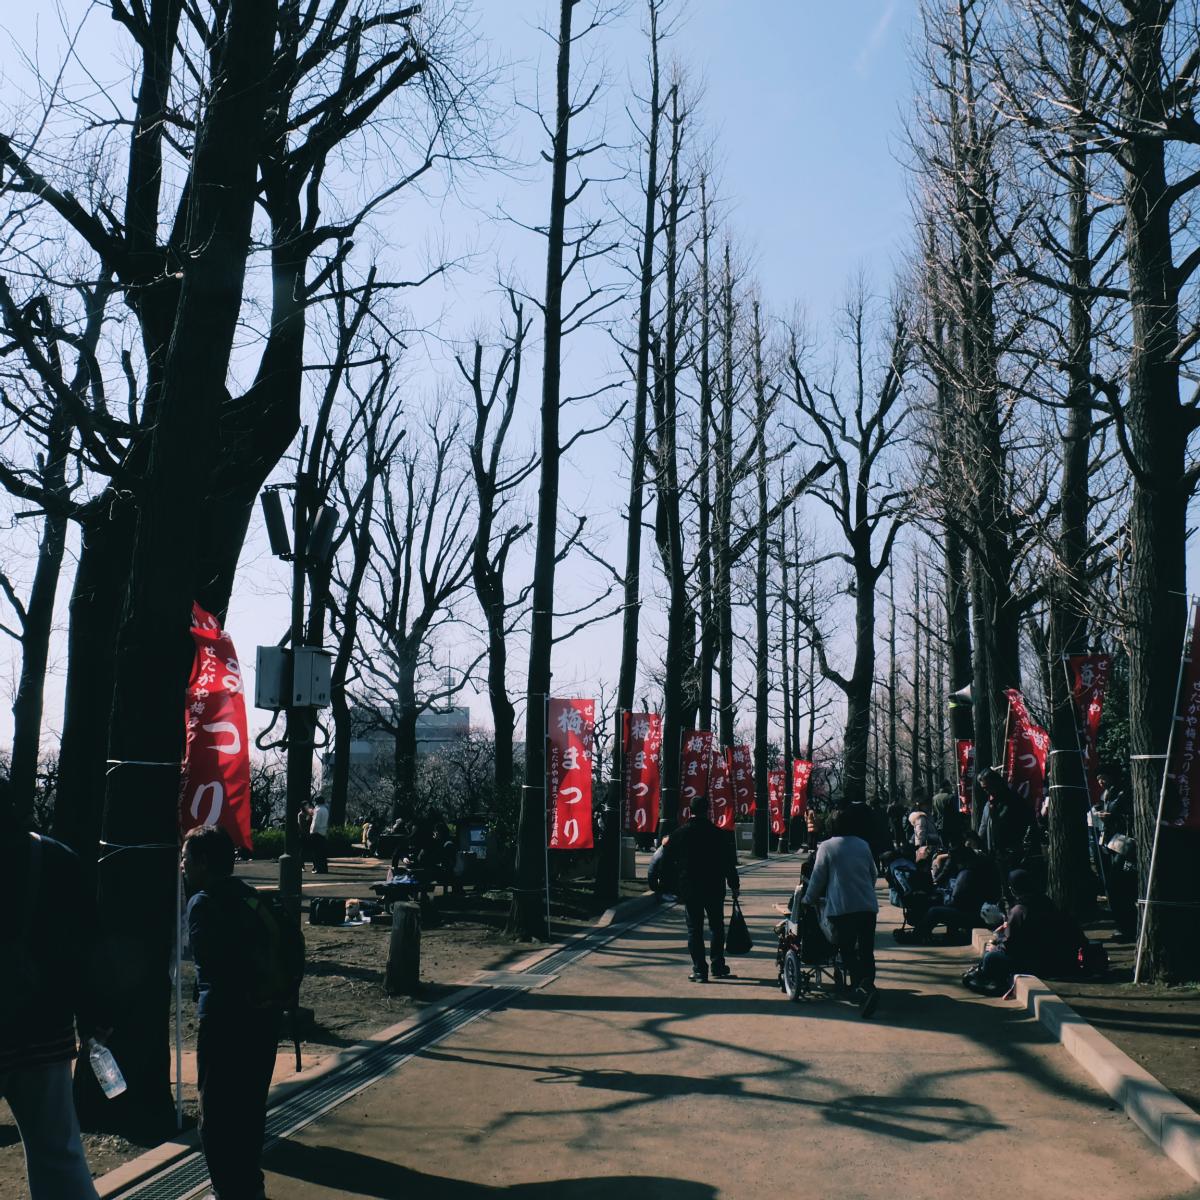 tokyo plum blossom viewing ume shimokitazawa 2